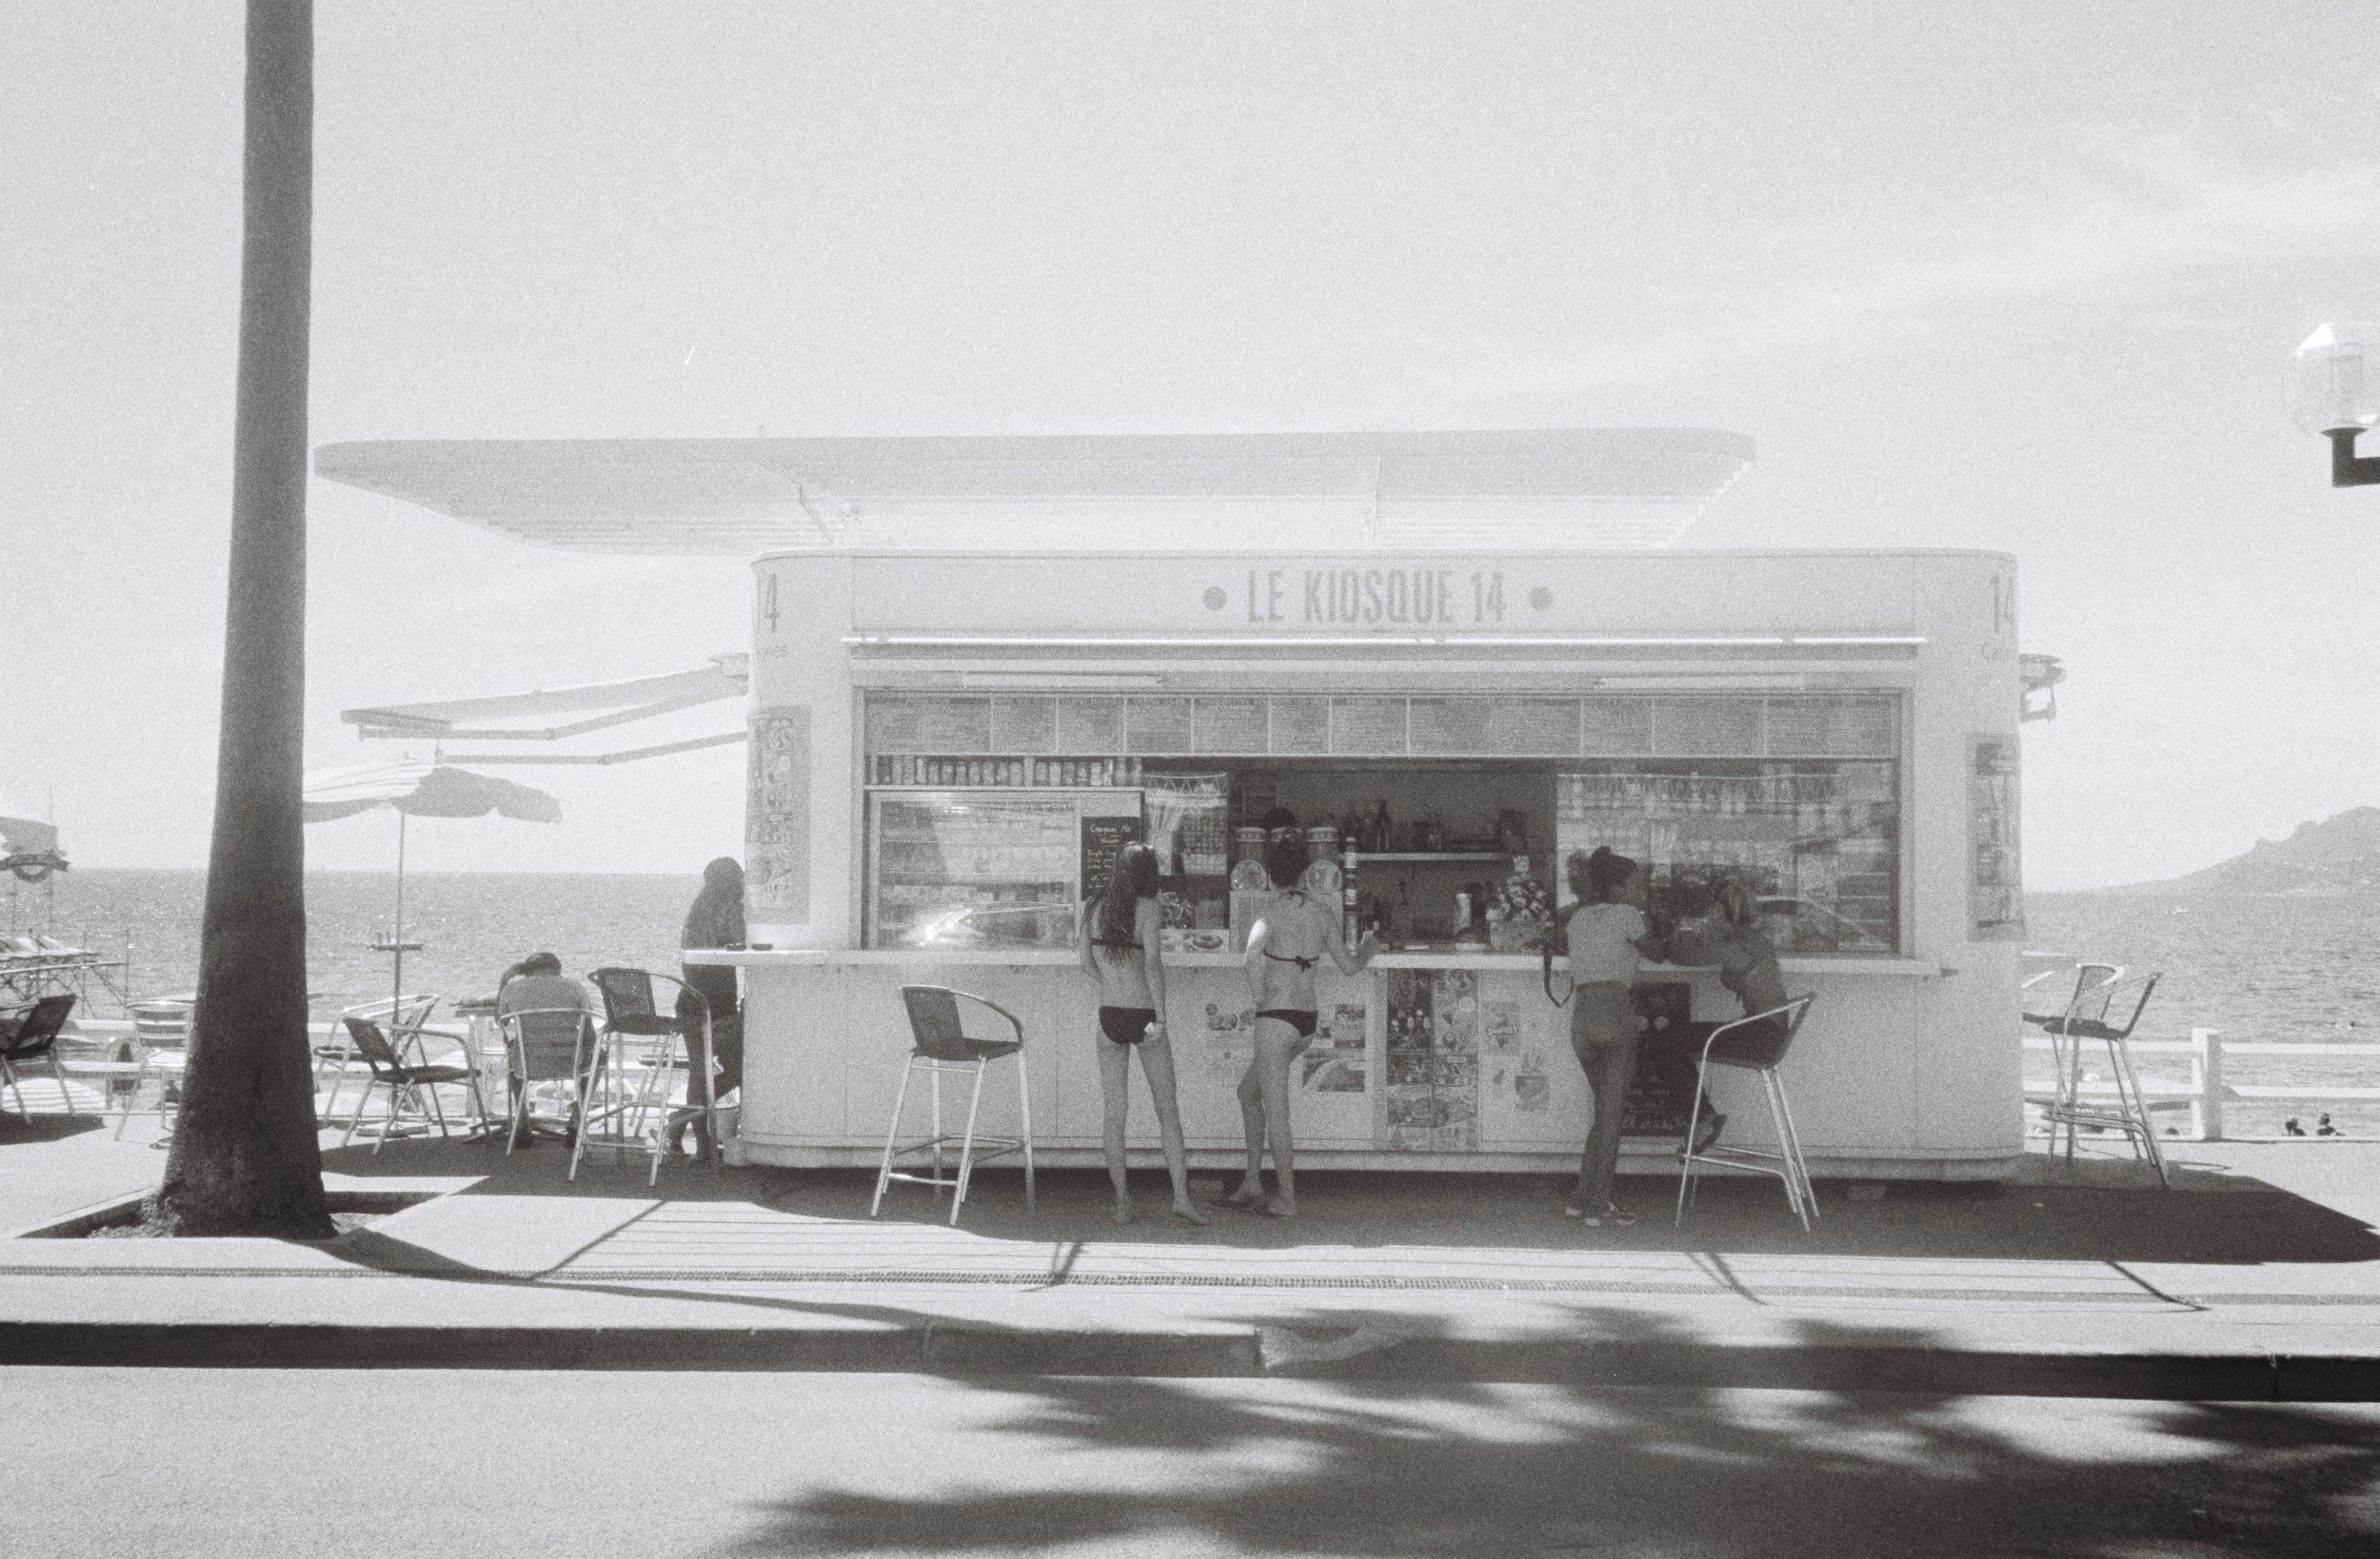 Le Kiosque 14, Midi Boulevard